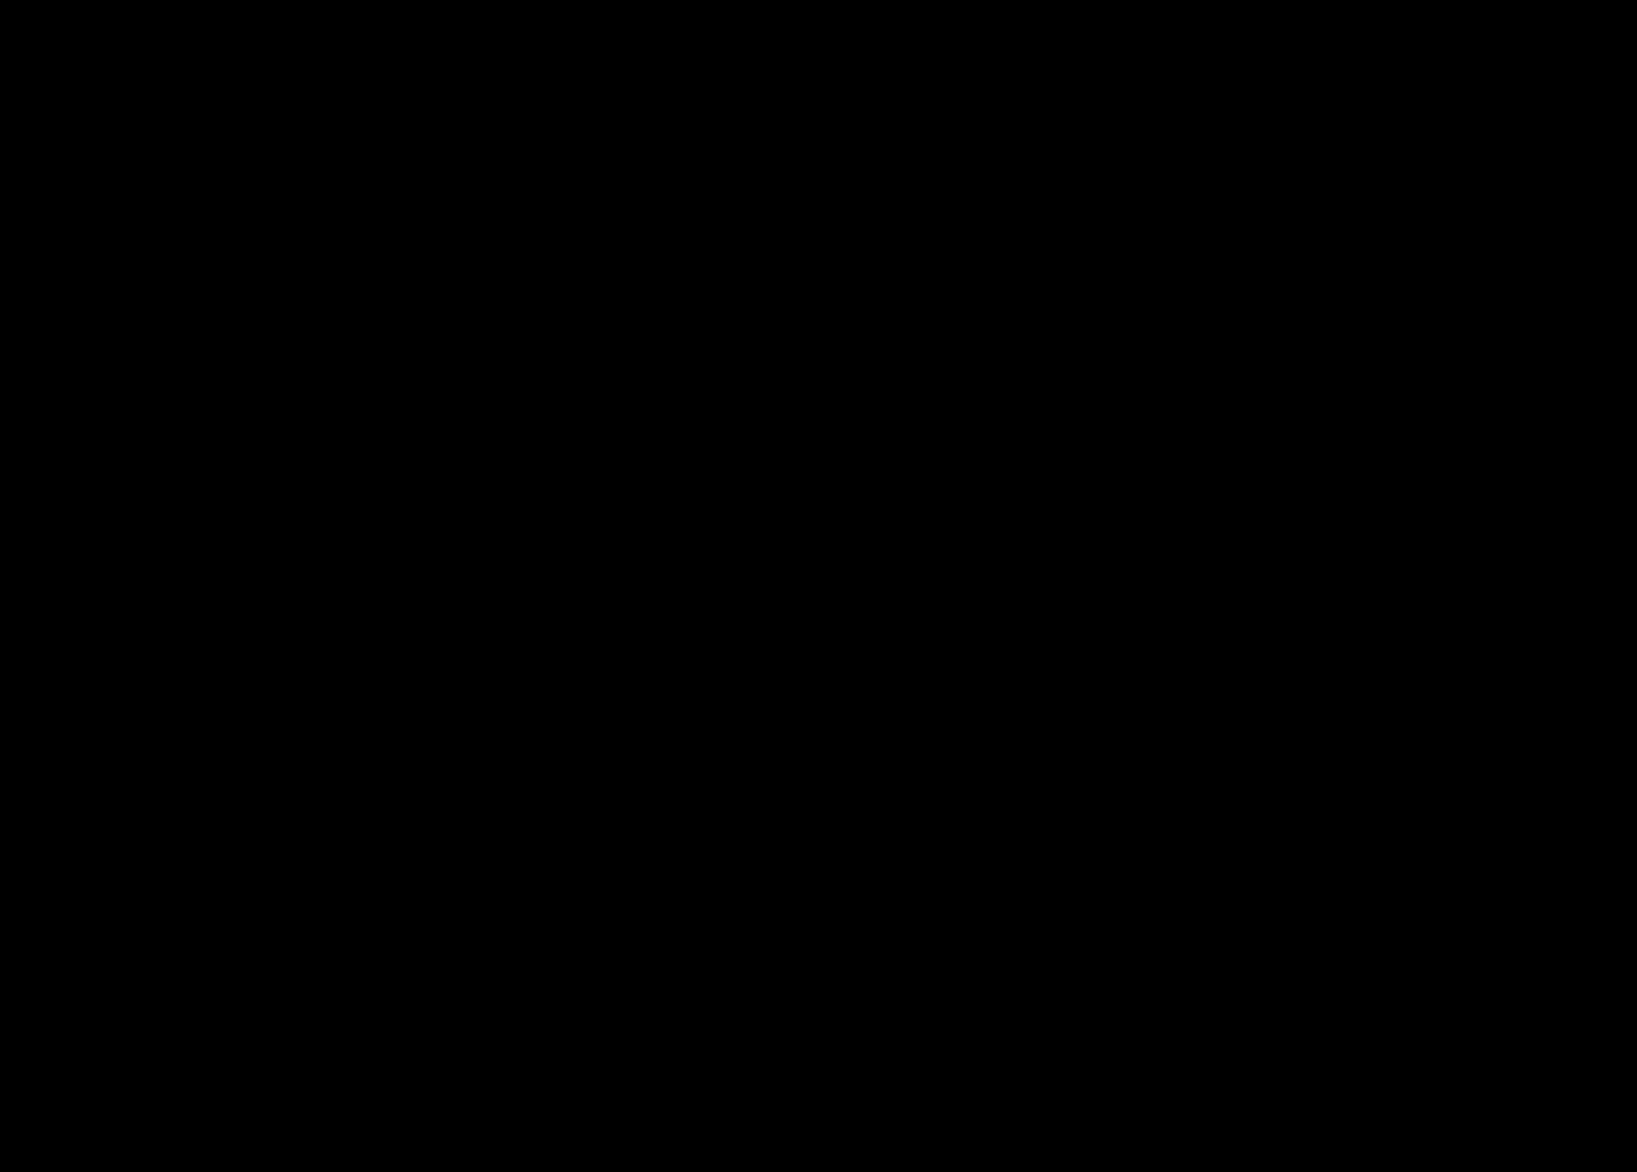 Talazoparib